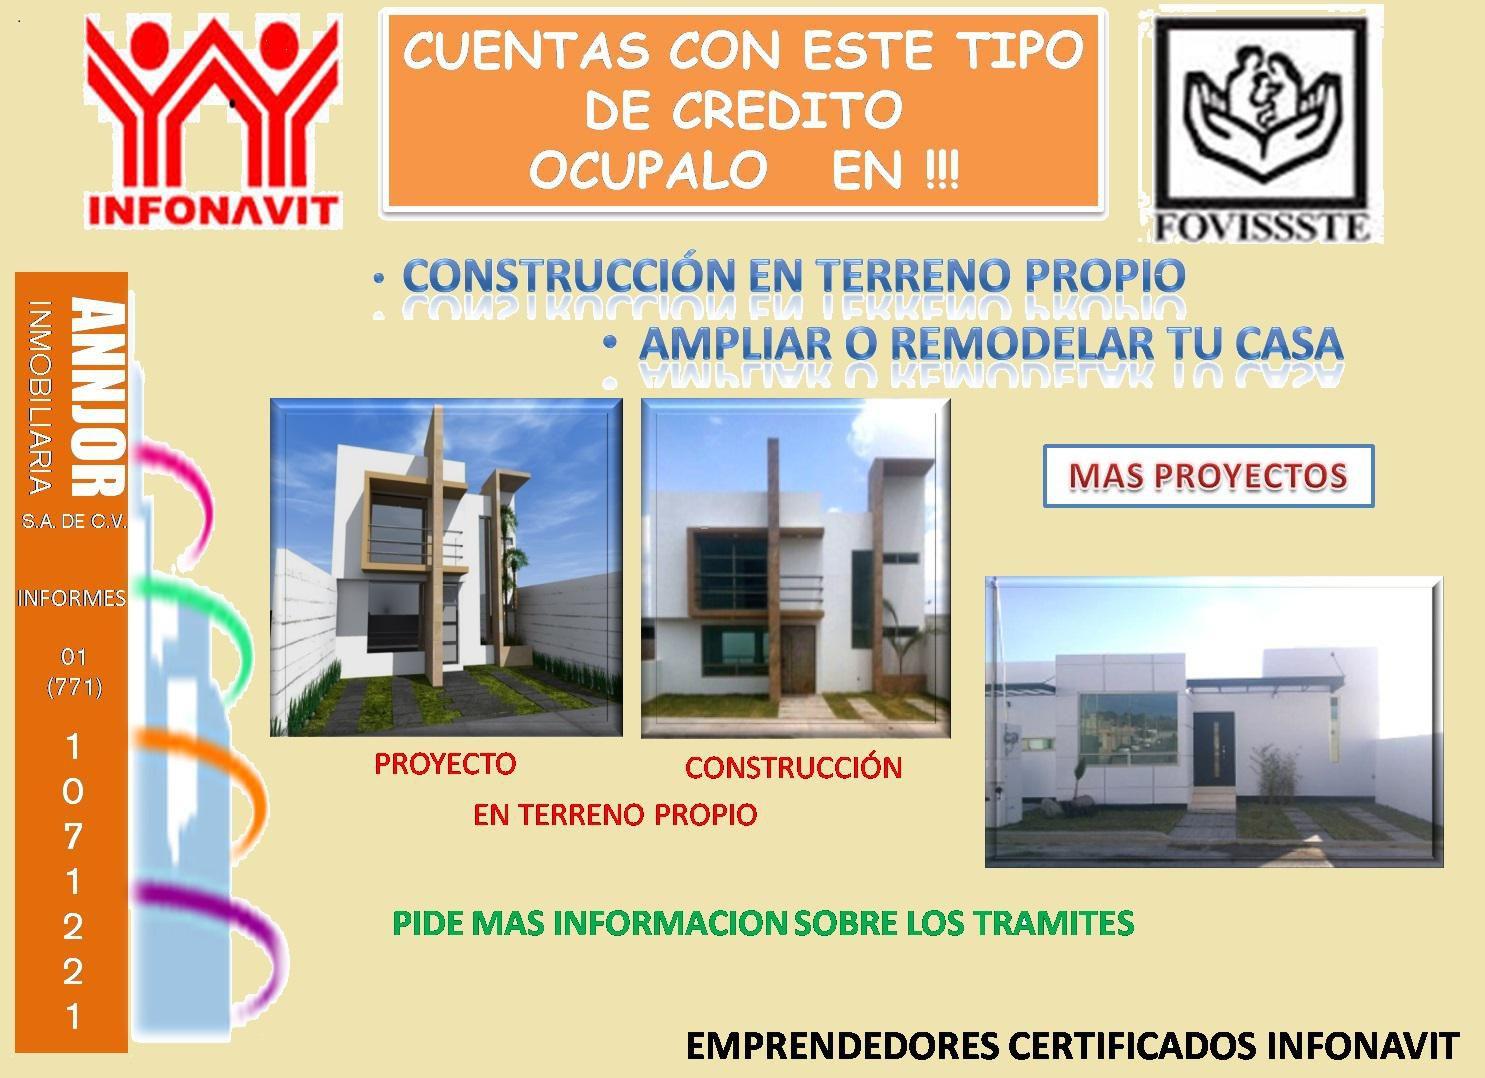 Remodela tu casa con credito infonavit for Remodela tu casa tu mismo